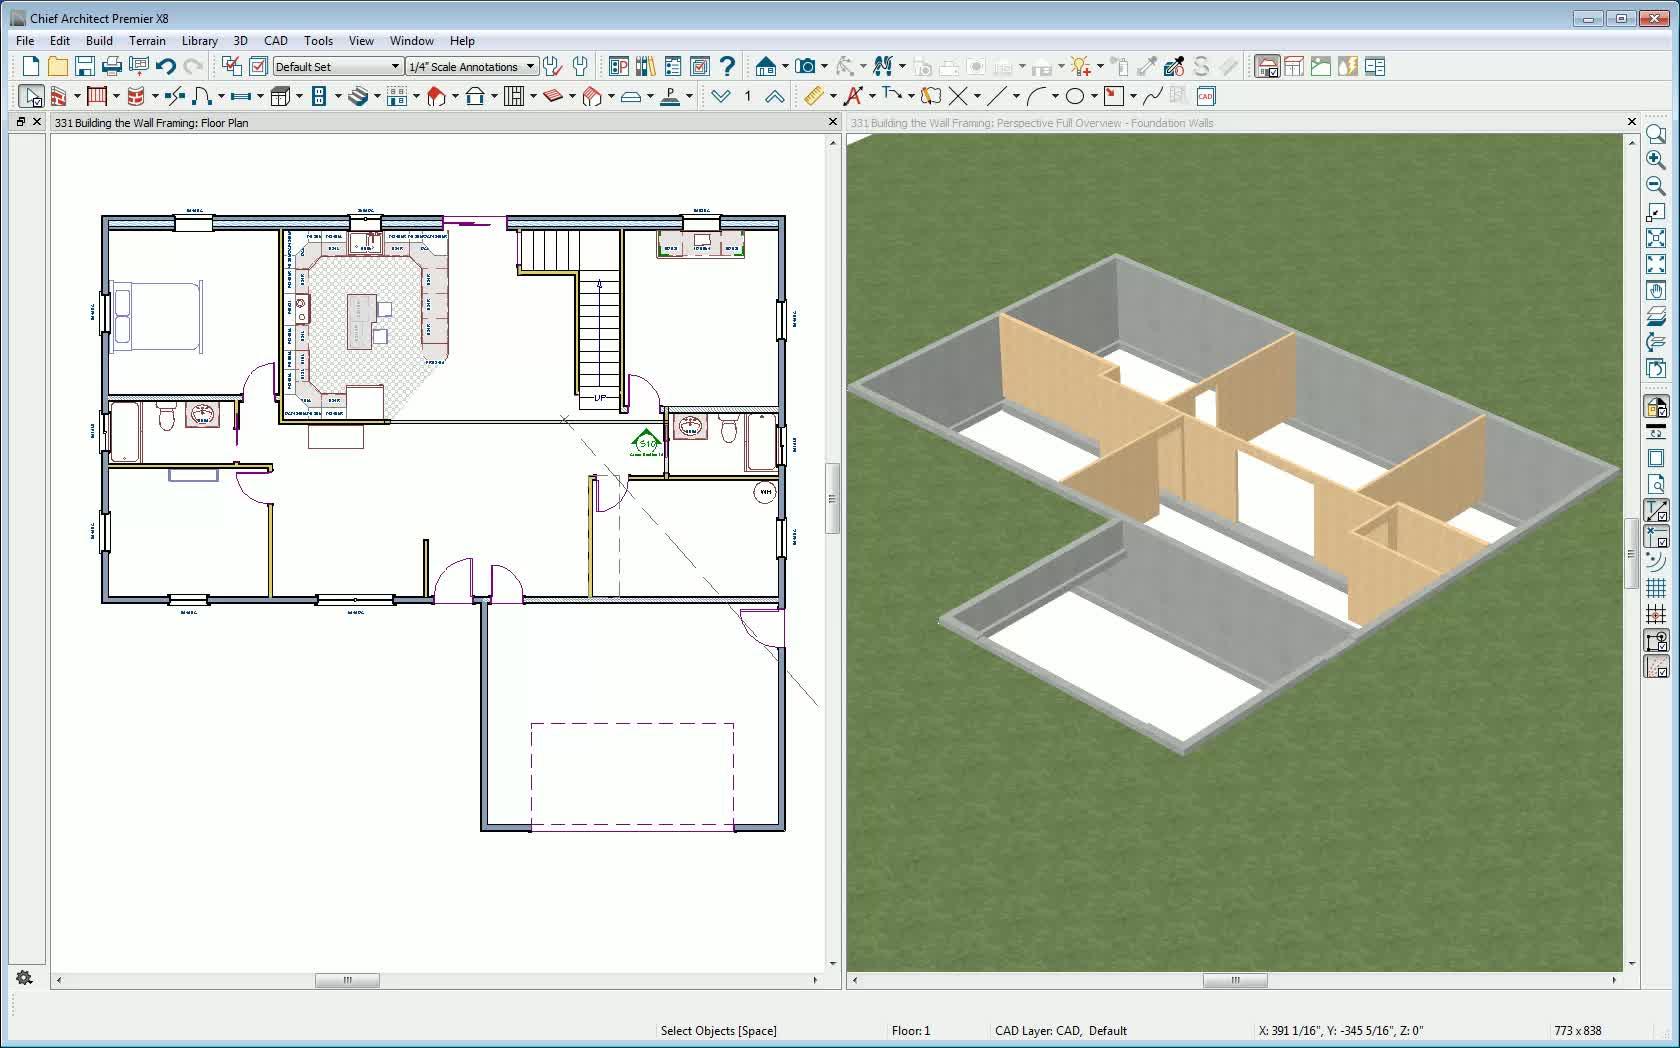 Chief Architect Premier X8 V18 2 Free Download Full